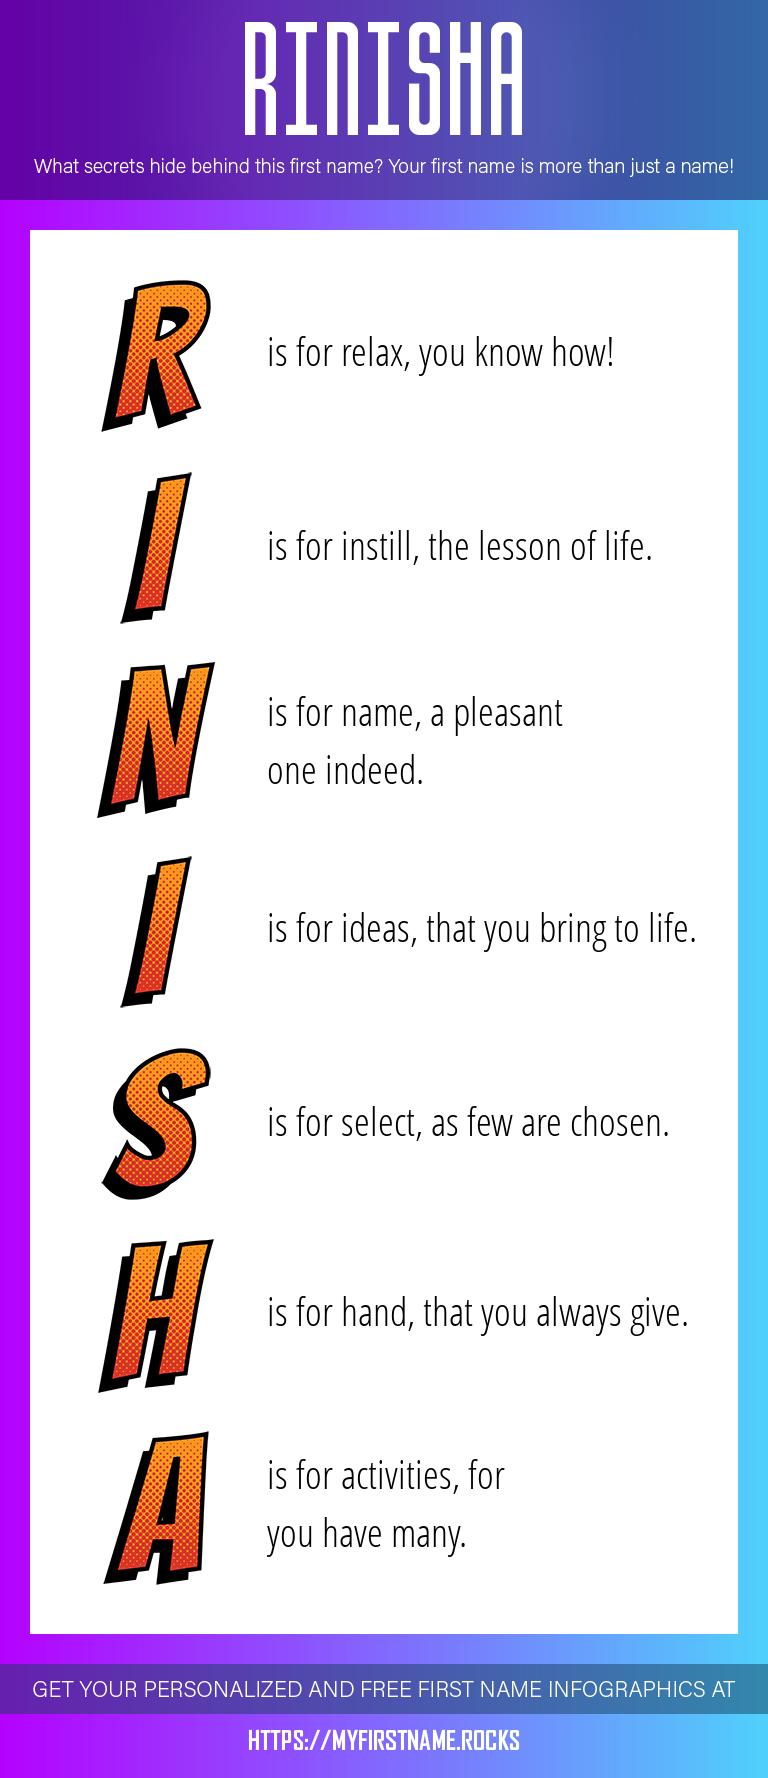 Rinisha Infographics